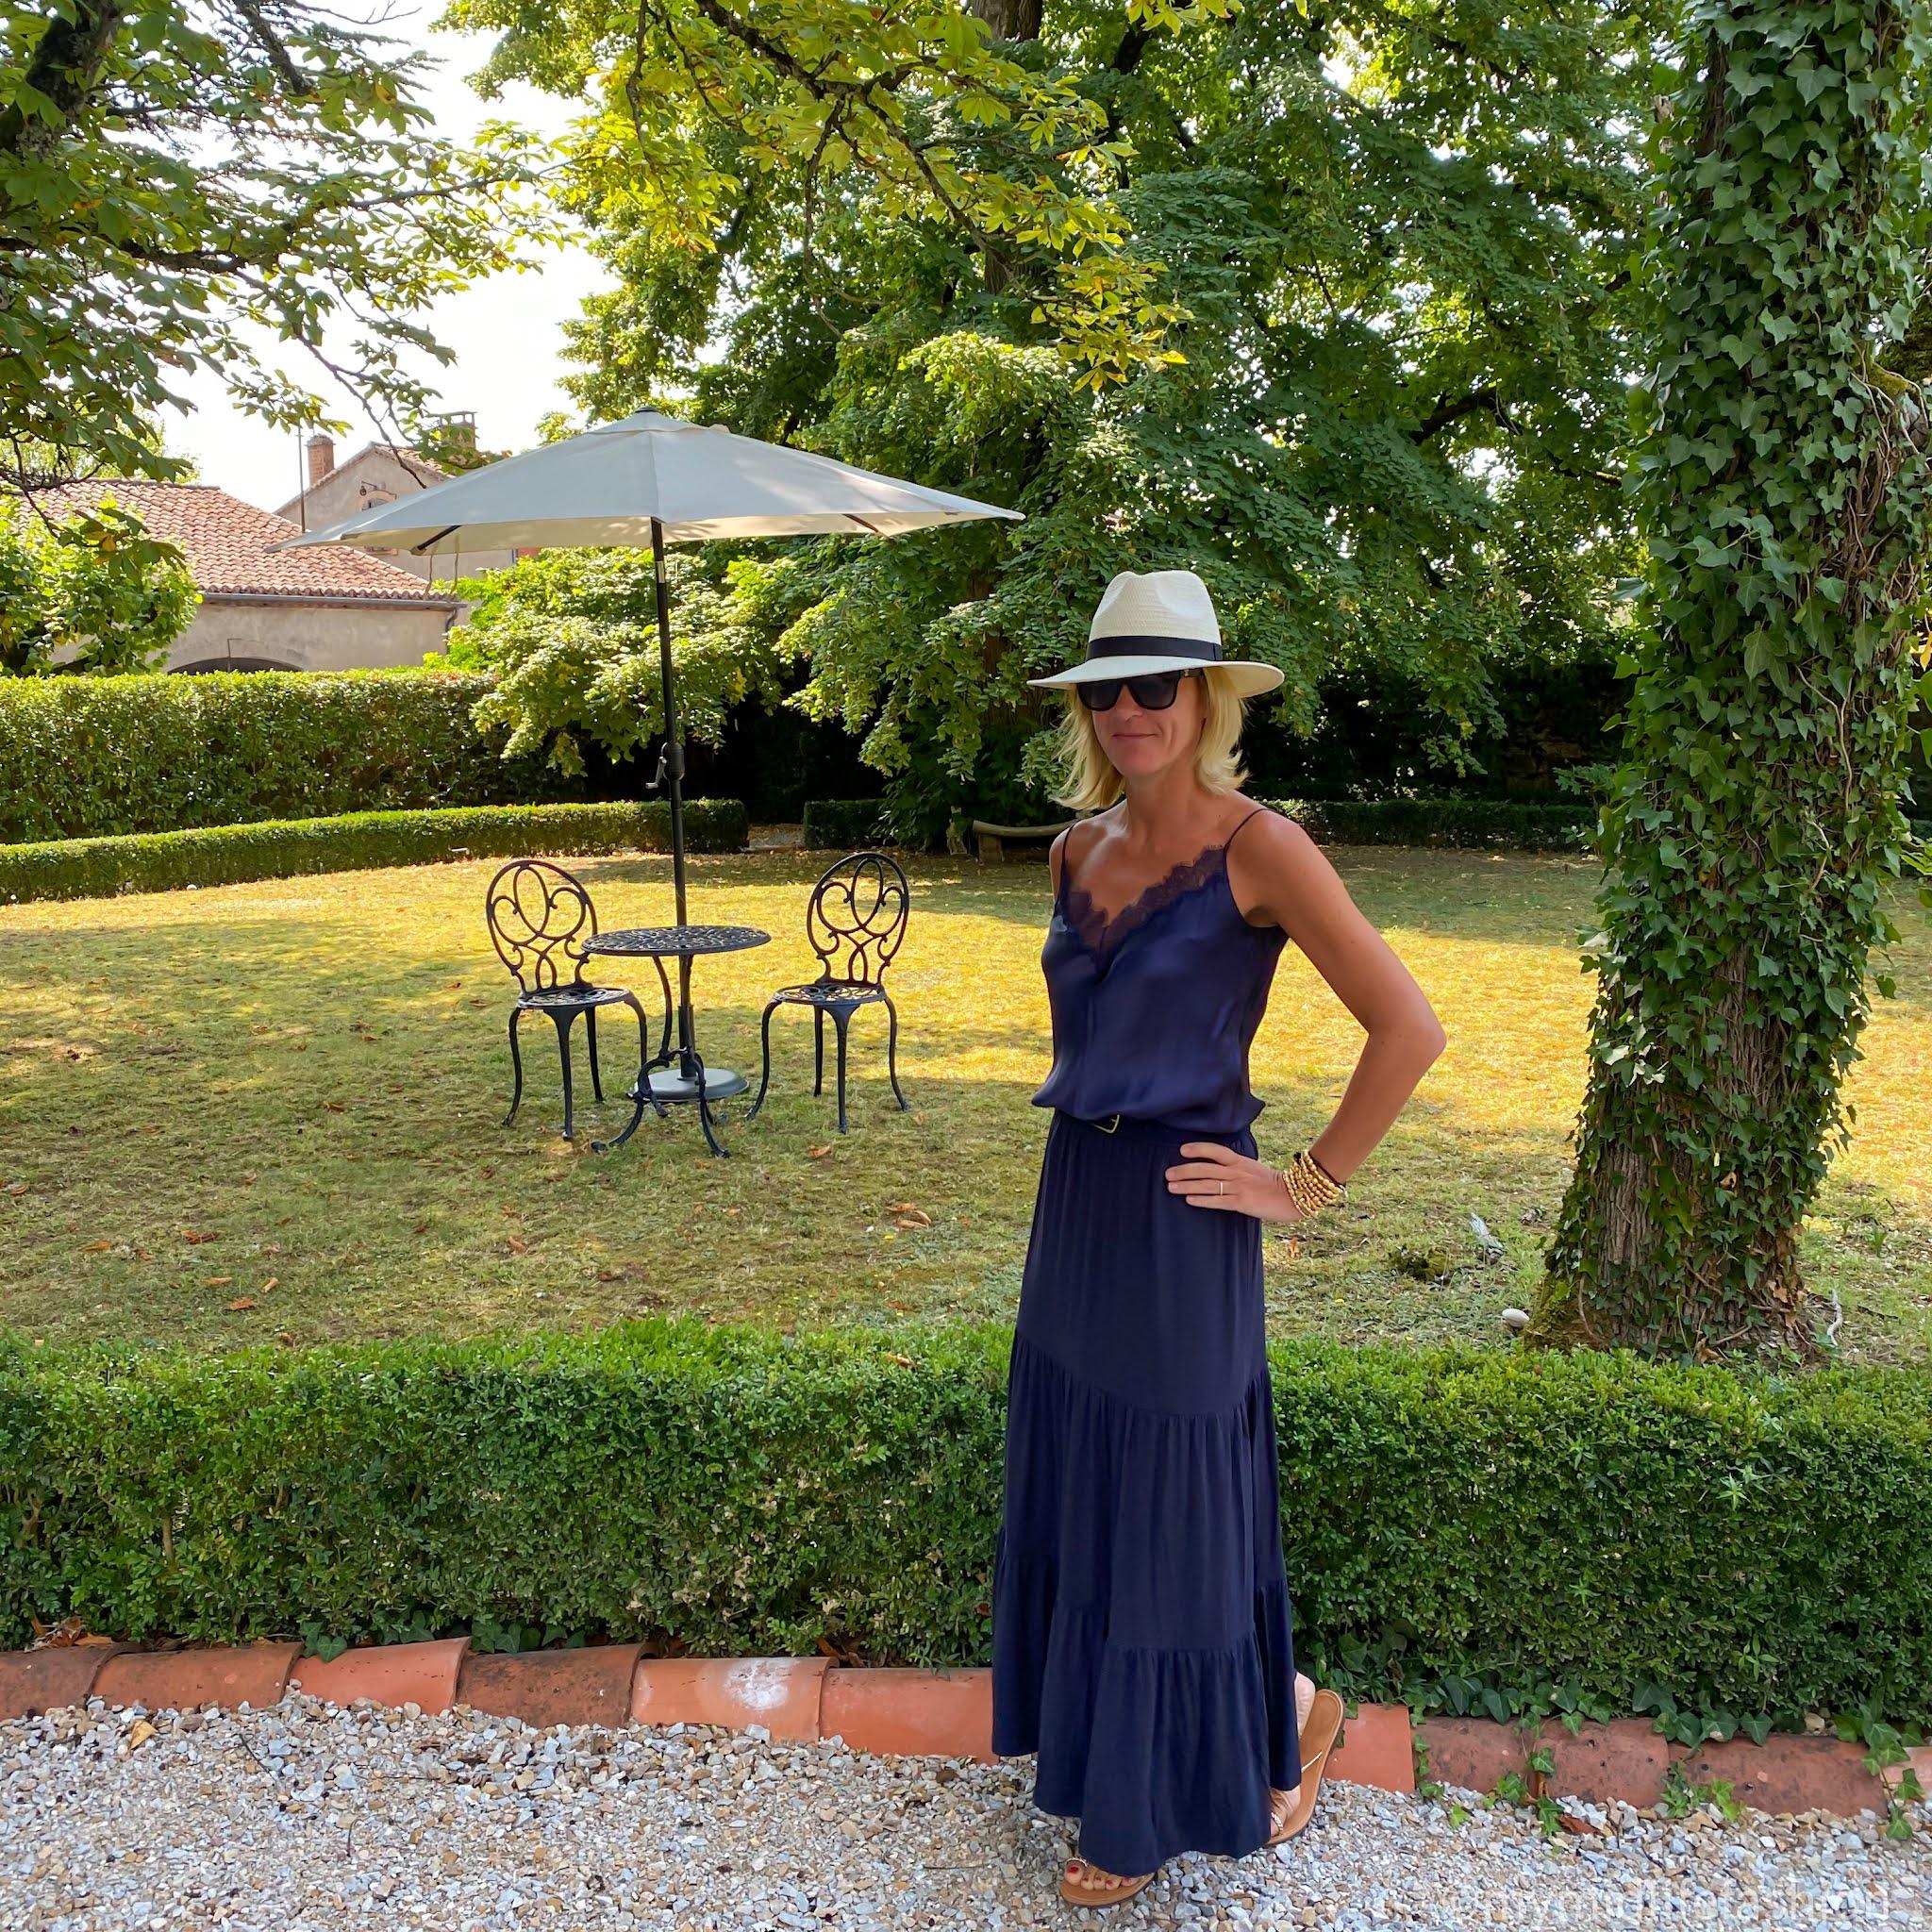 my midlife fashion, saint and Sofia greenwich skirt, Massimo Dutti lace trim silk camisole, speak out Chris braided gold sandals, j crew leather belt, Zara Panama hat